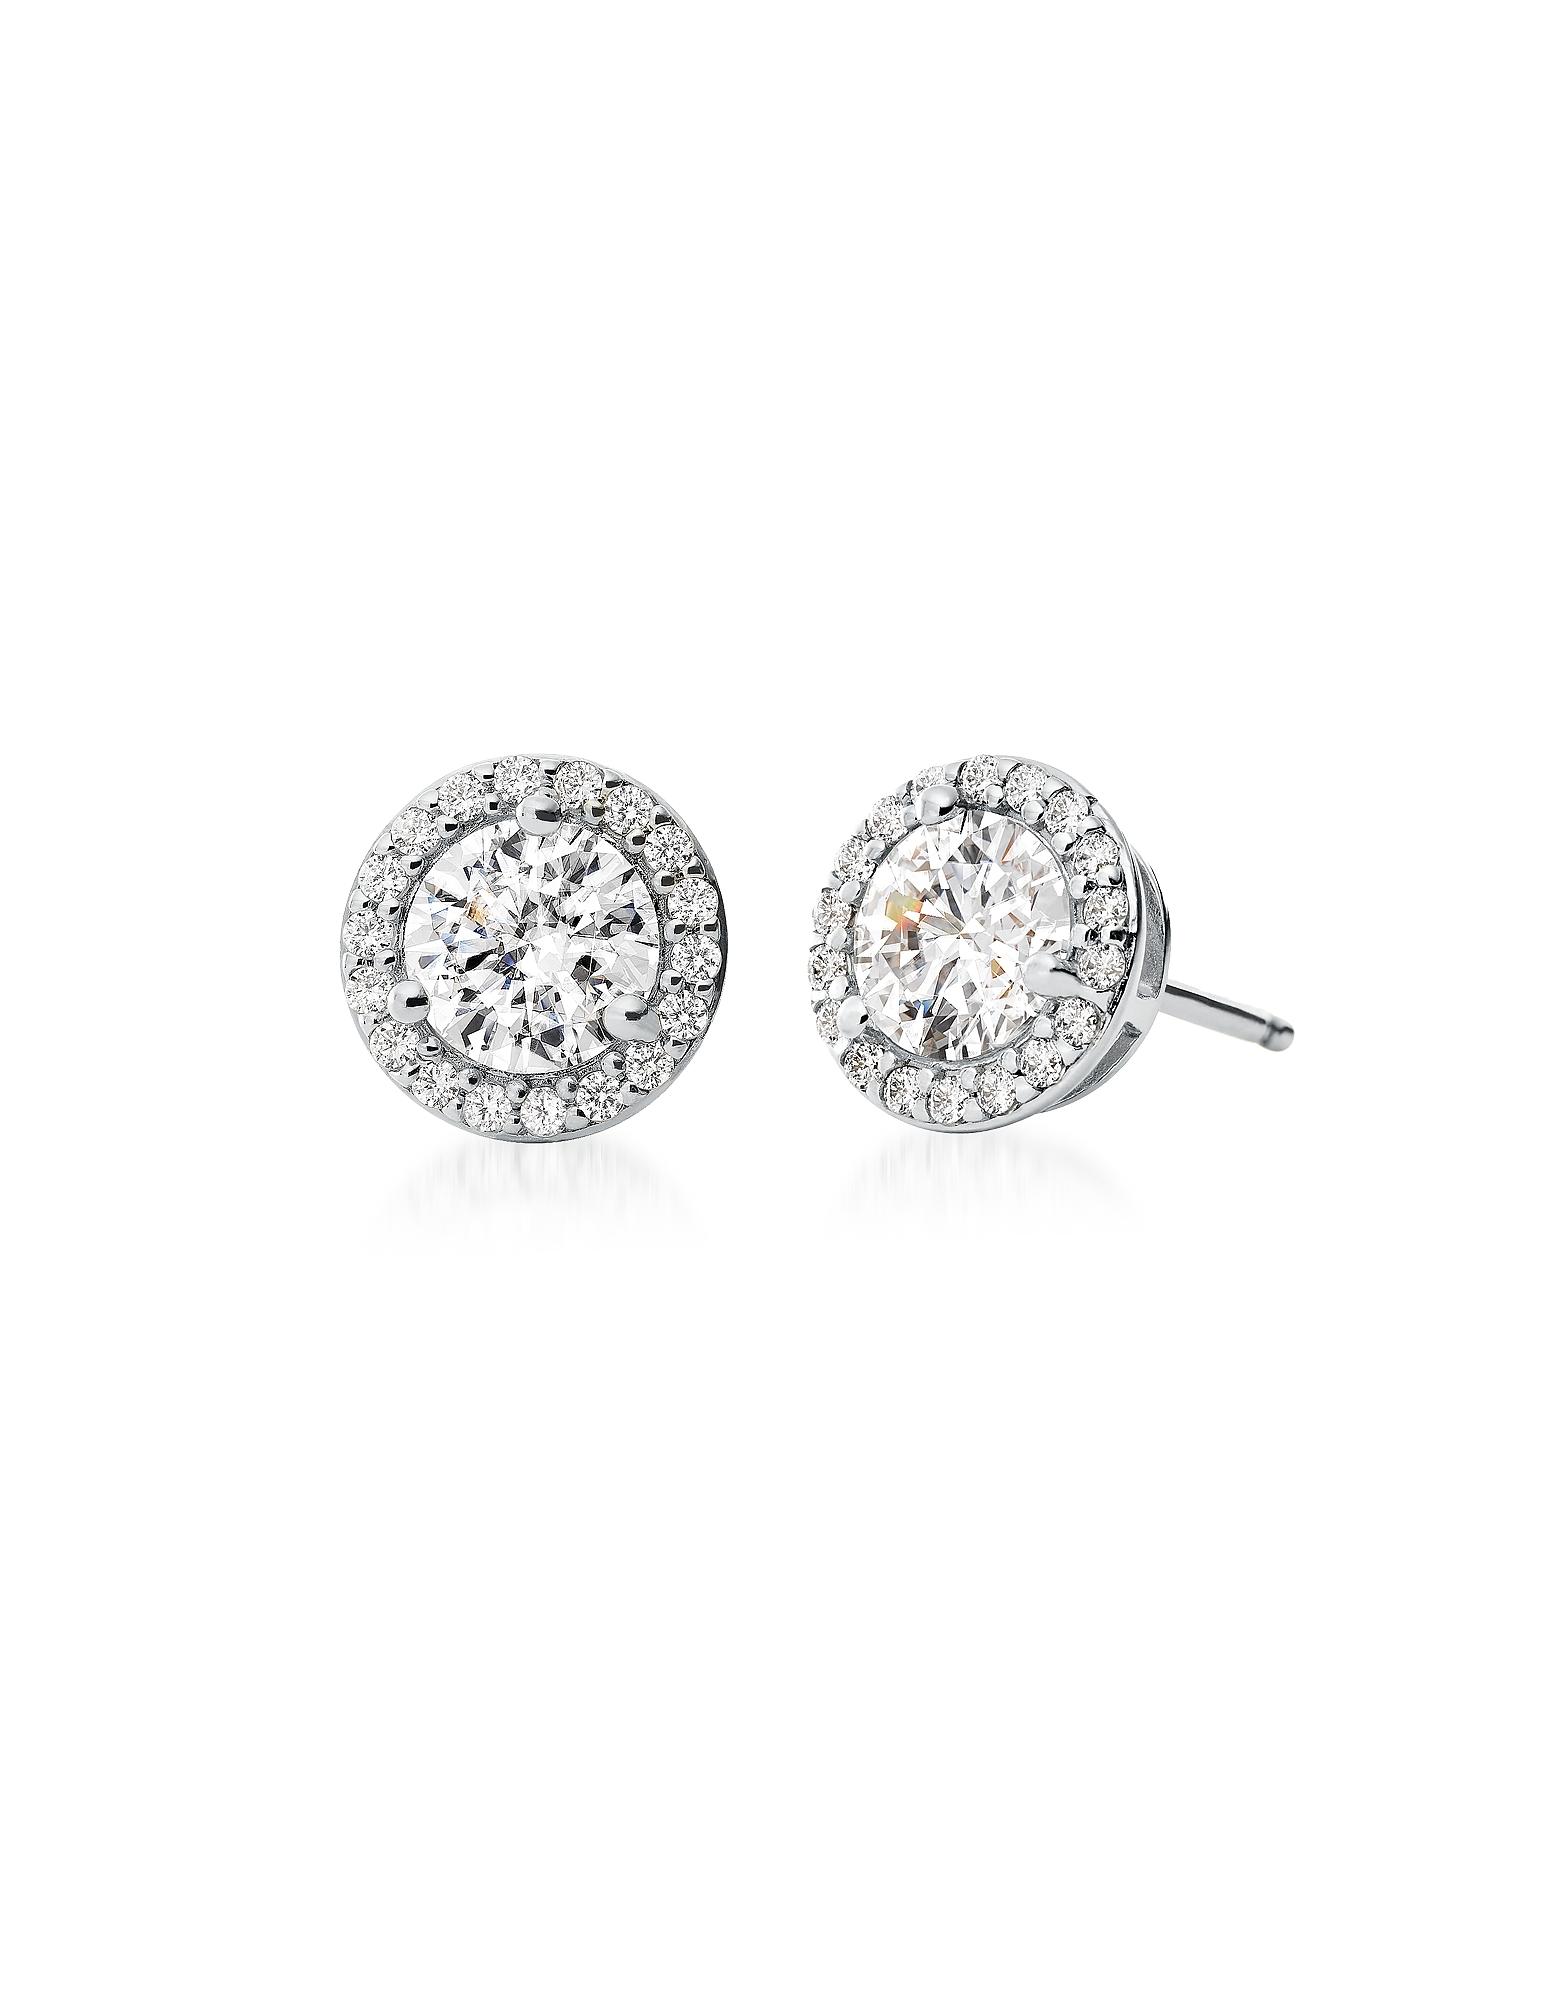 MICHAEL KORS | Michael Kors Designer Earrings, MKC1035AN040 Stud Earrings Earring | Goxip